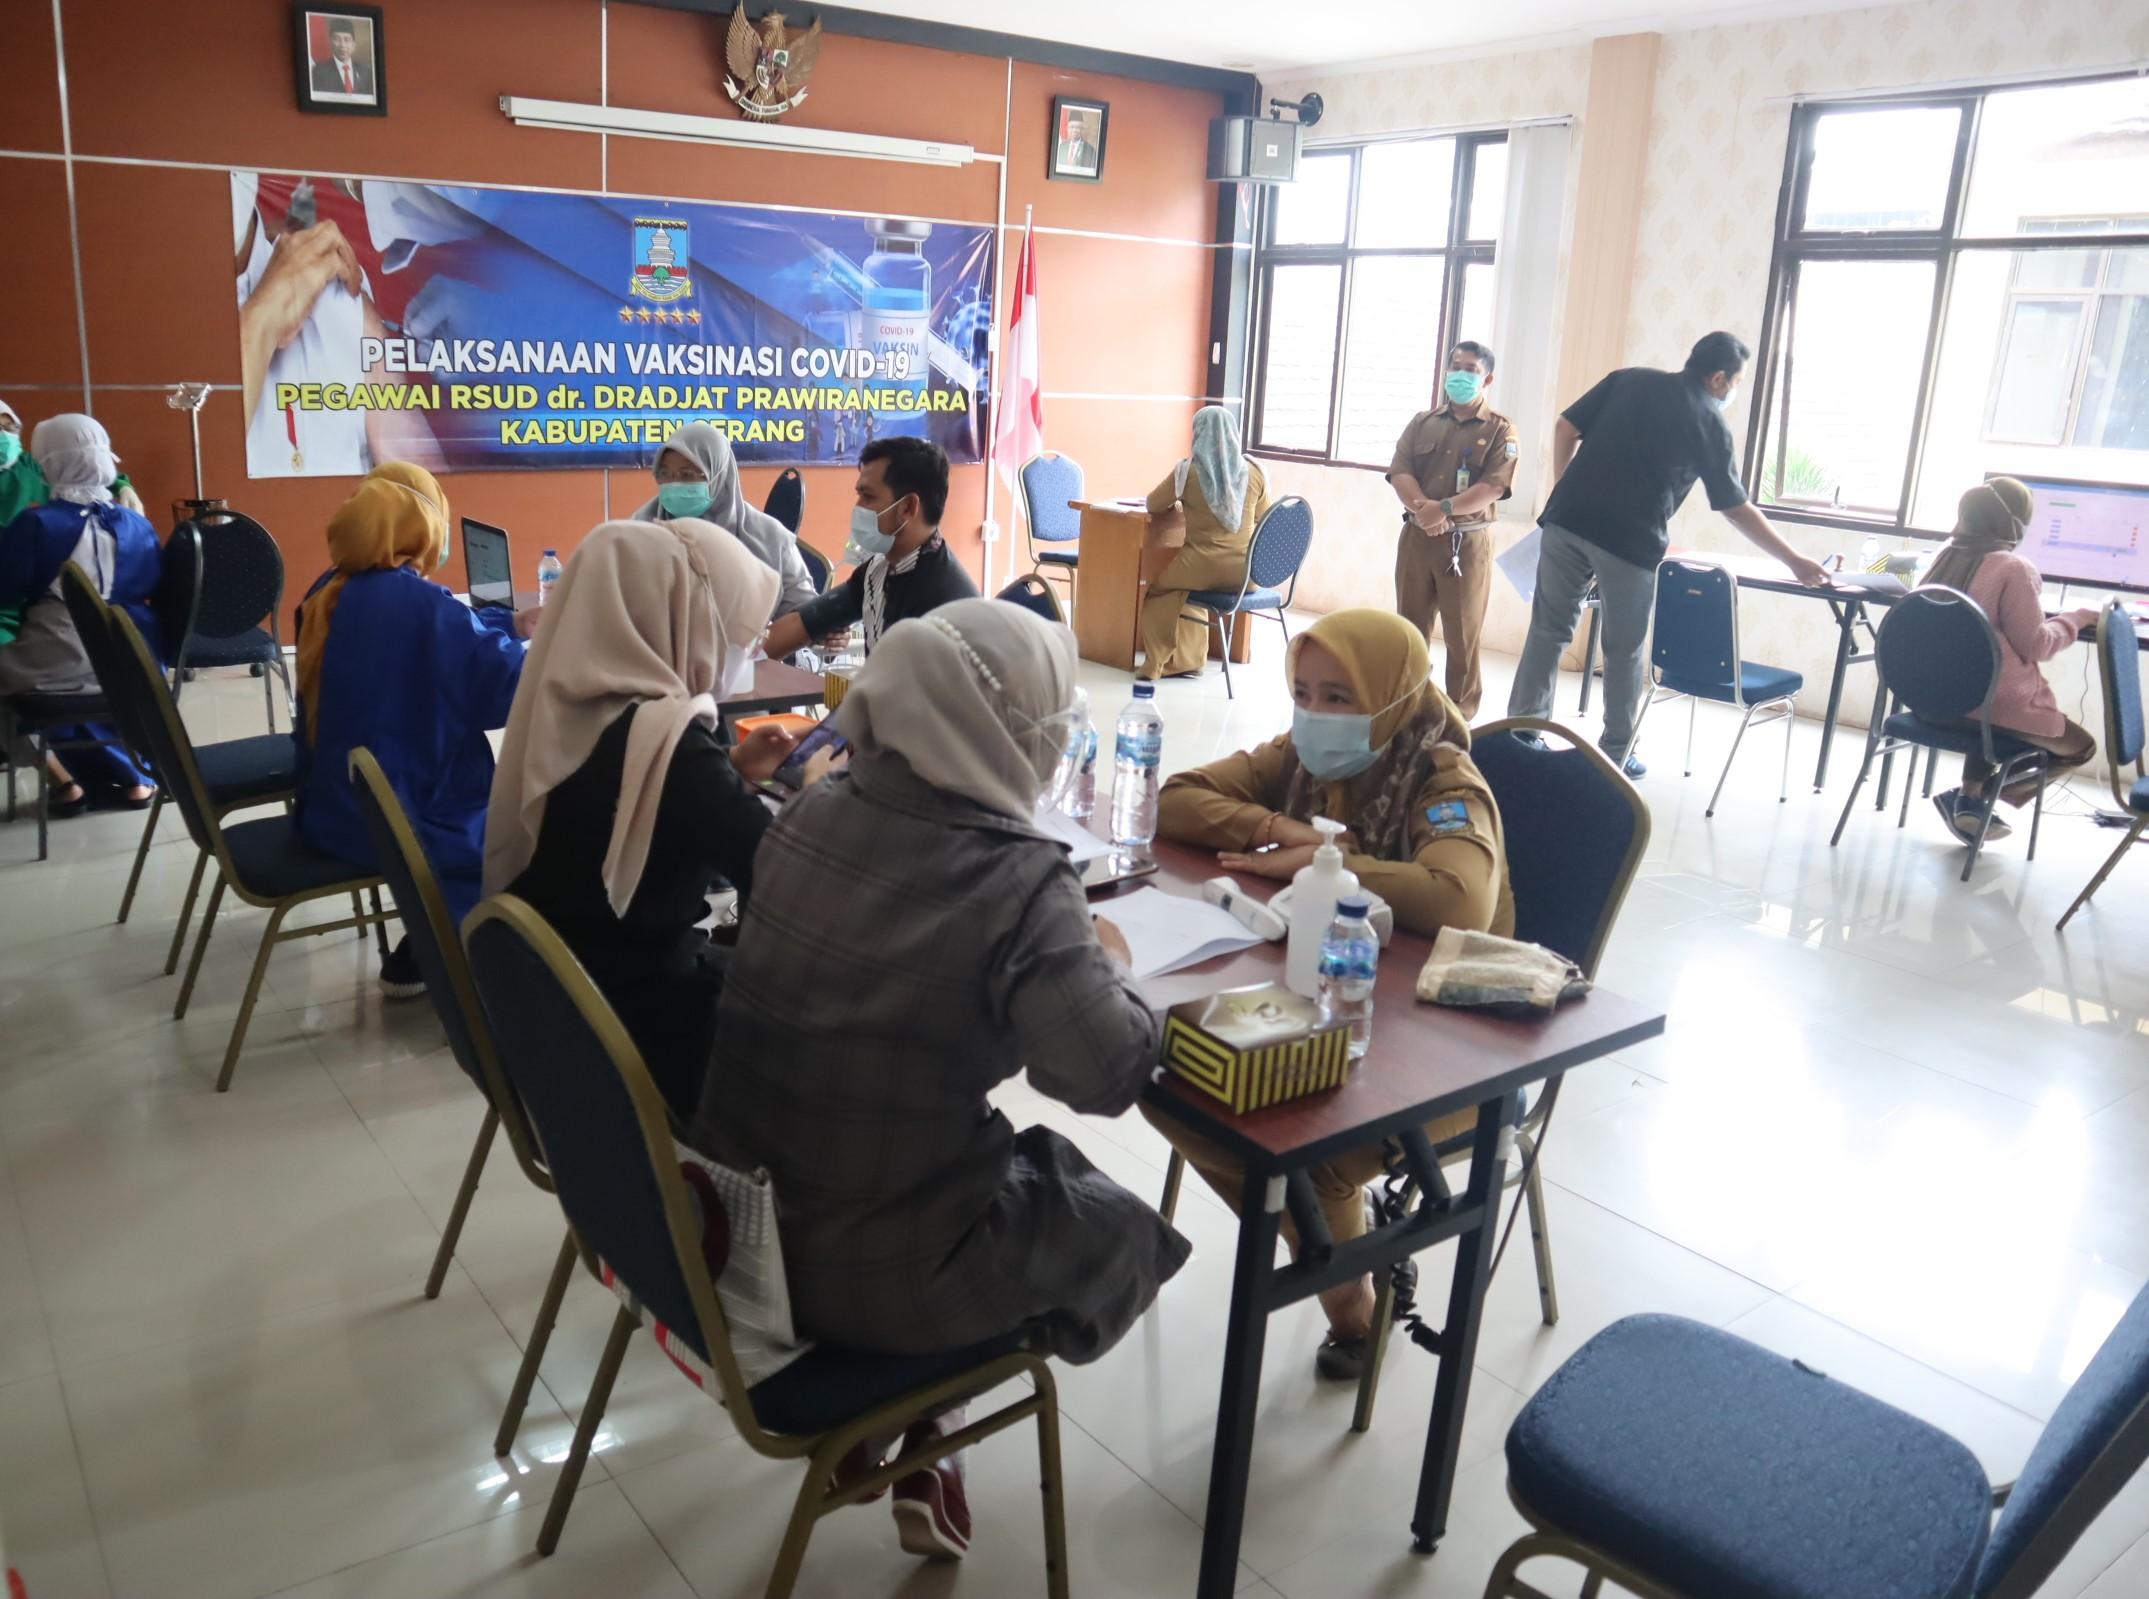 pelaksanaan-vaksinasi-covid-19-pegawai-rsud-dr-dradjat-prawiranegara-kabupaten-serang